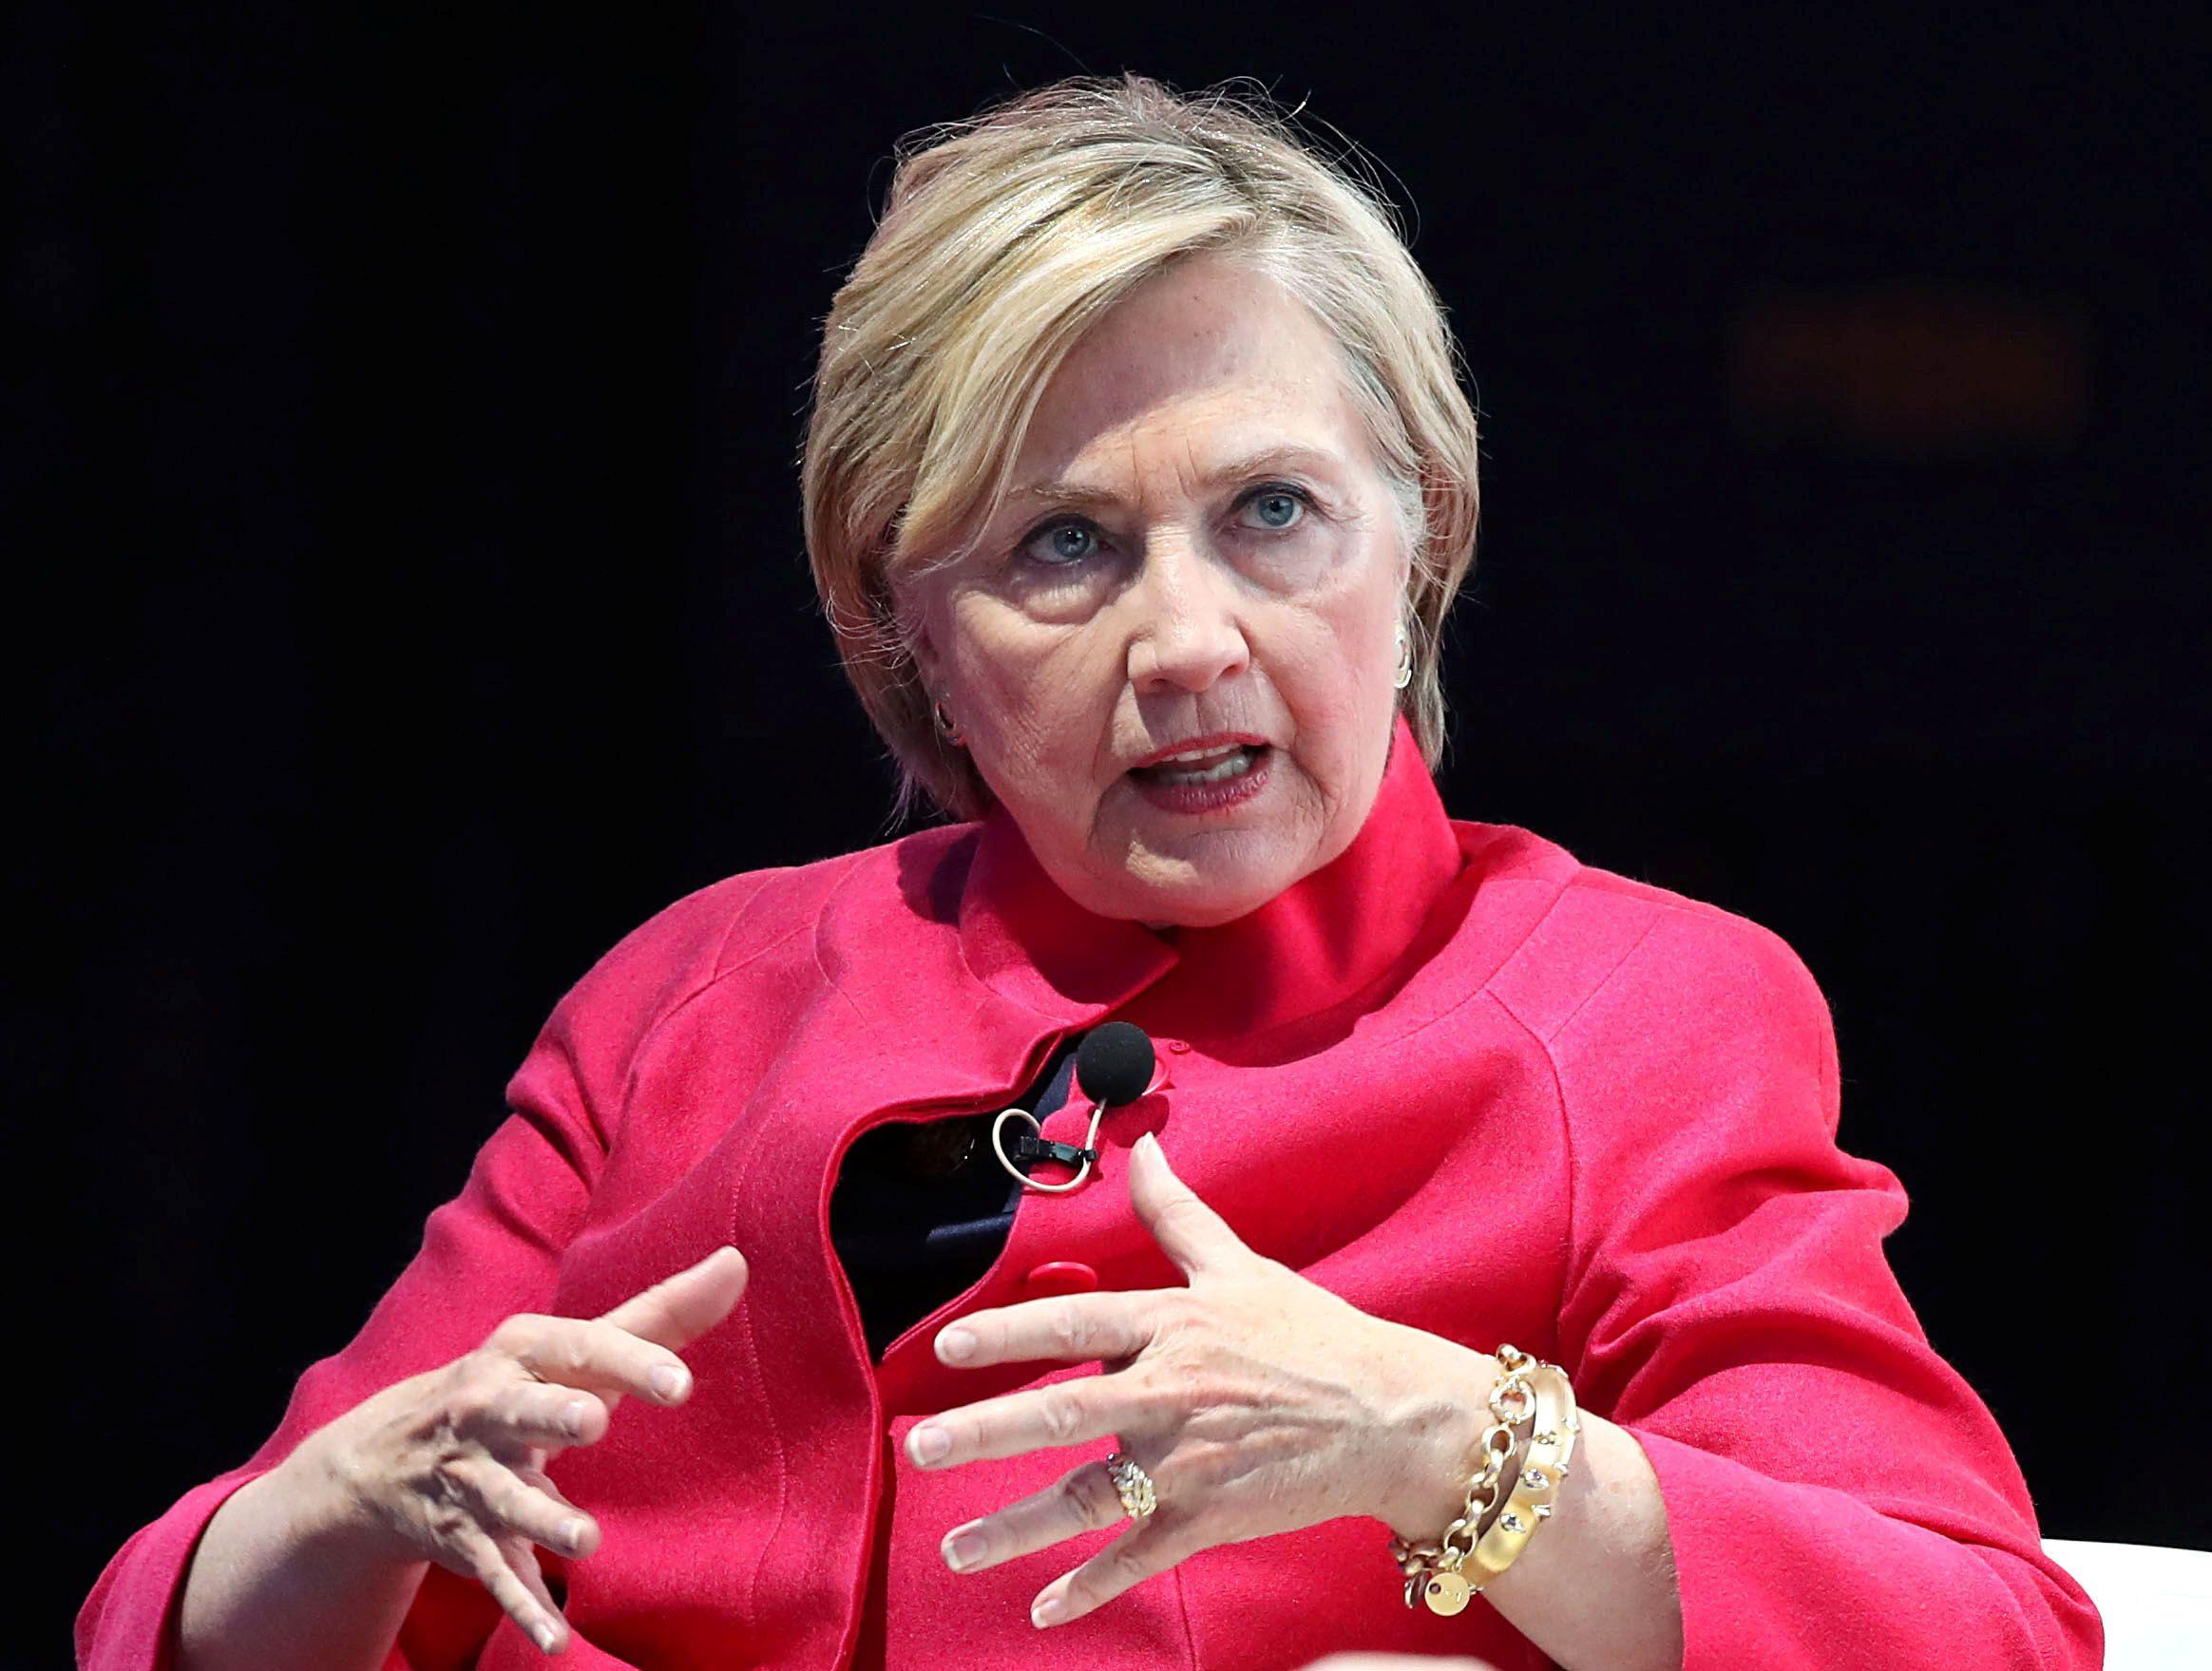 10_26_Hillary_Clinton